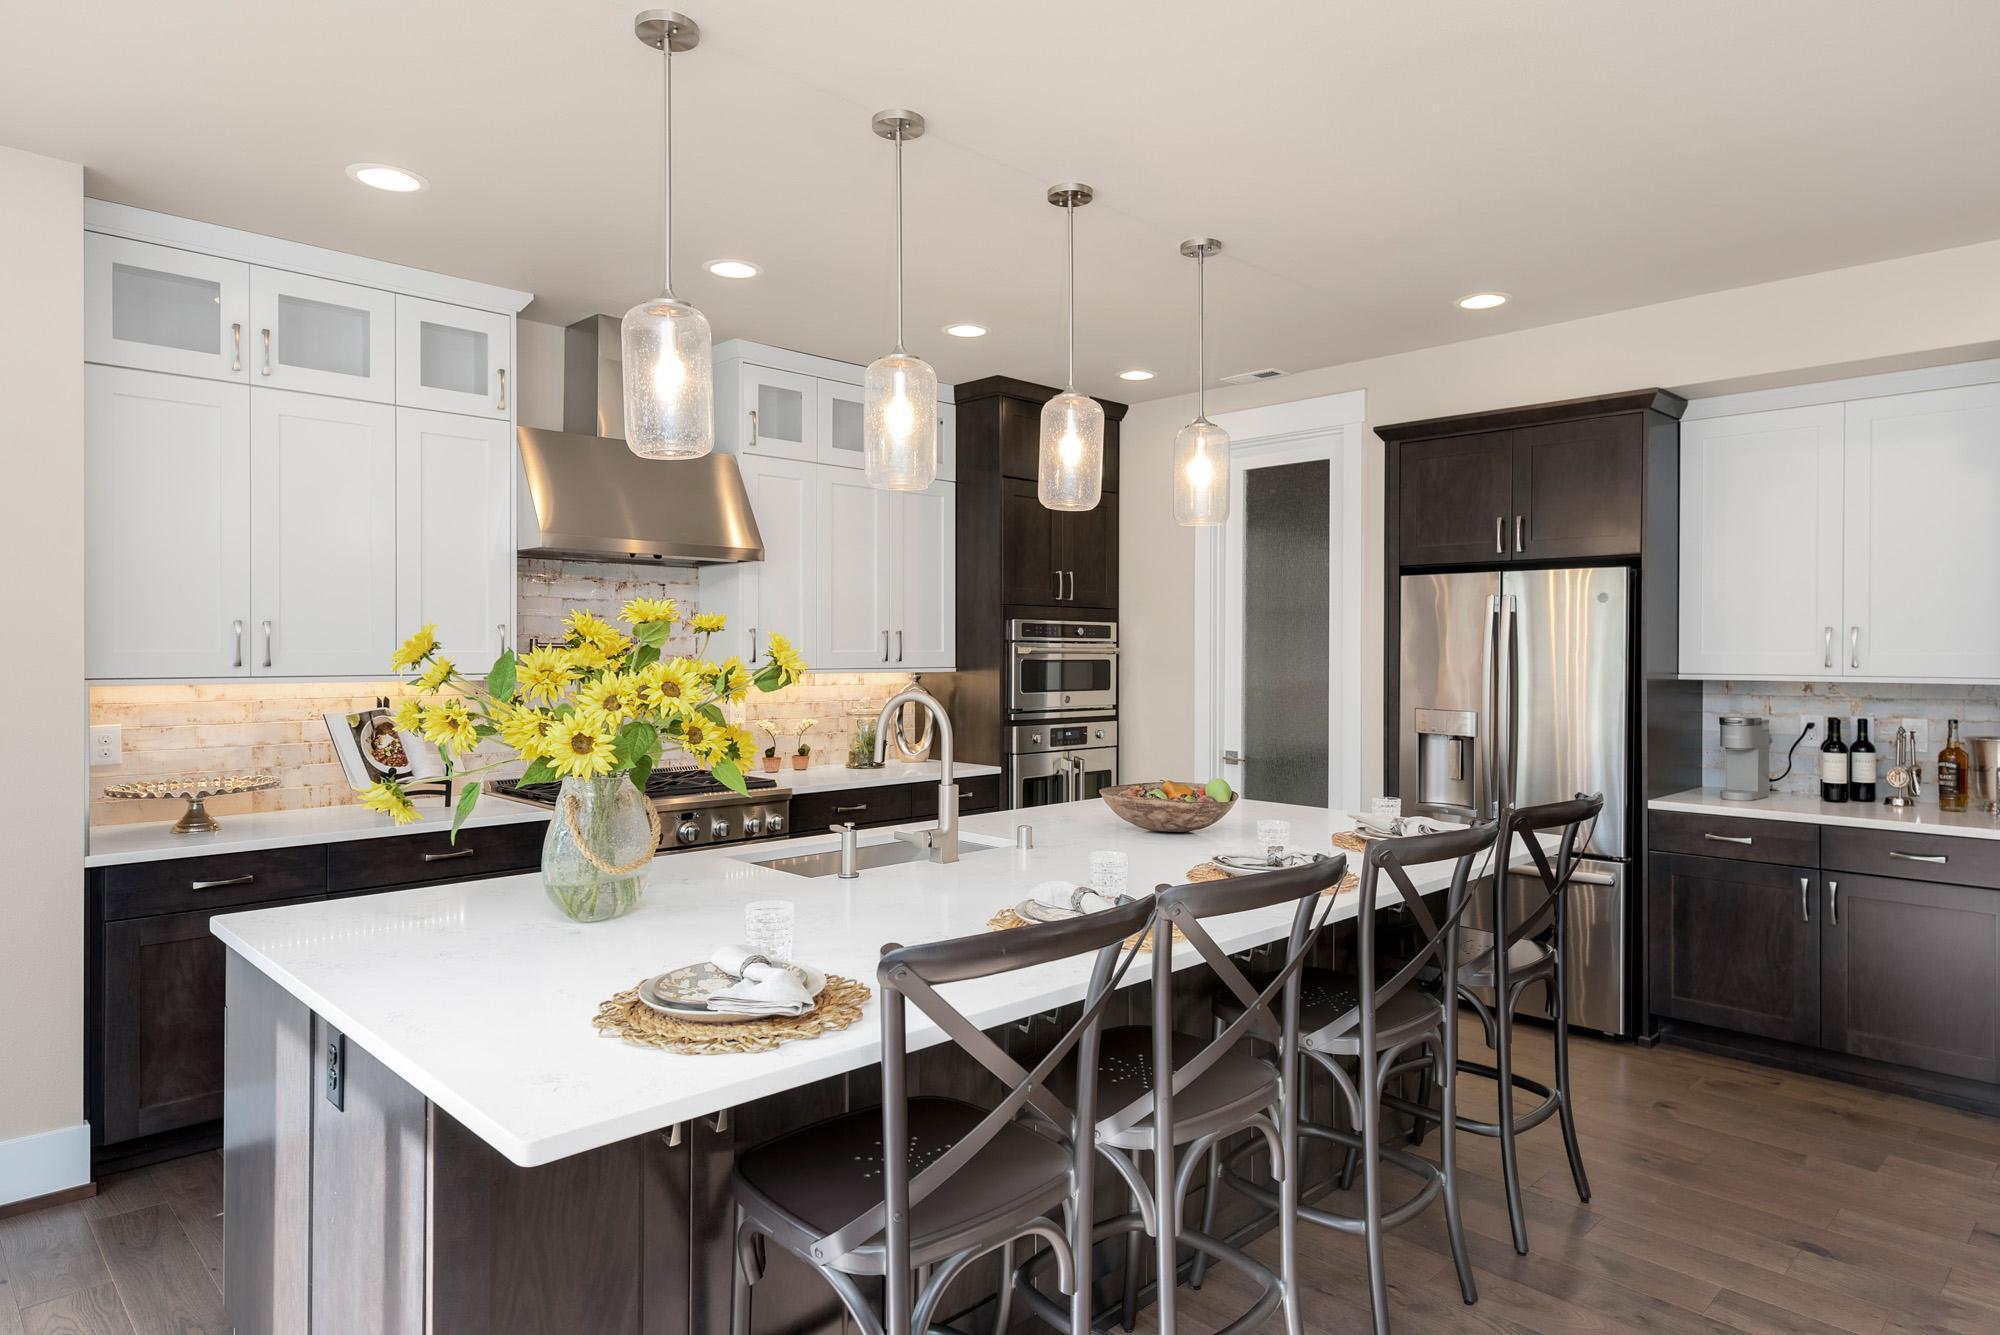 Kitchen featured in the Plan 263 By Schneider Family Homes in Seattle-Bellevue, WA